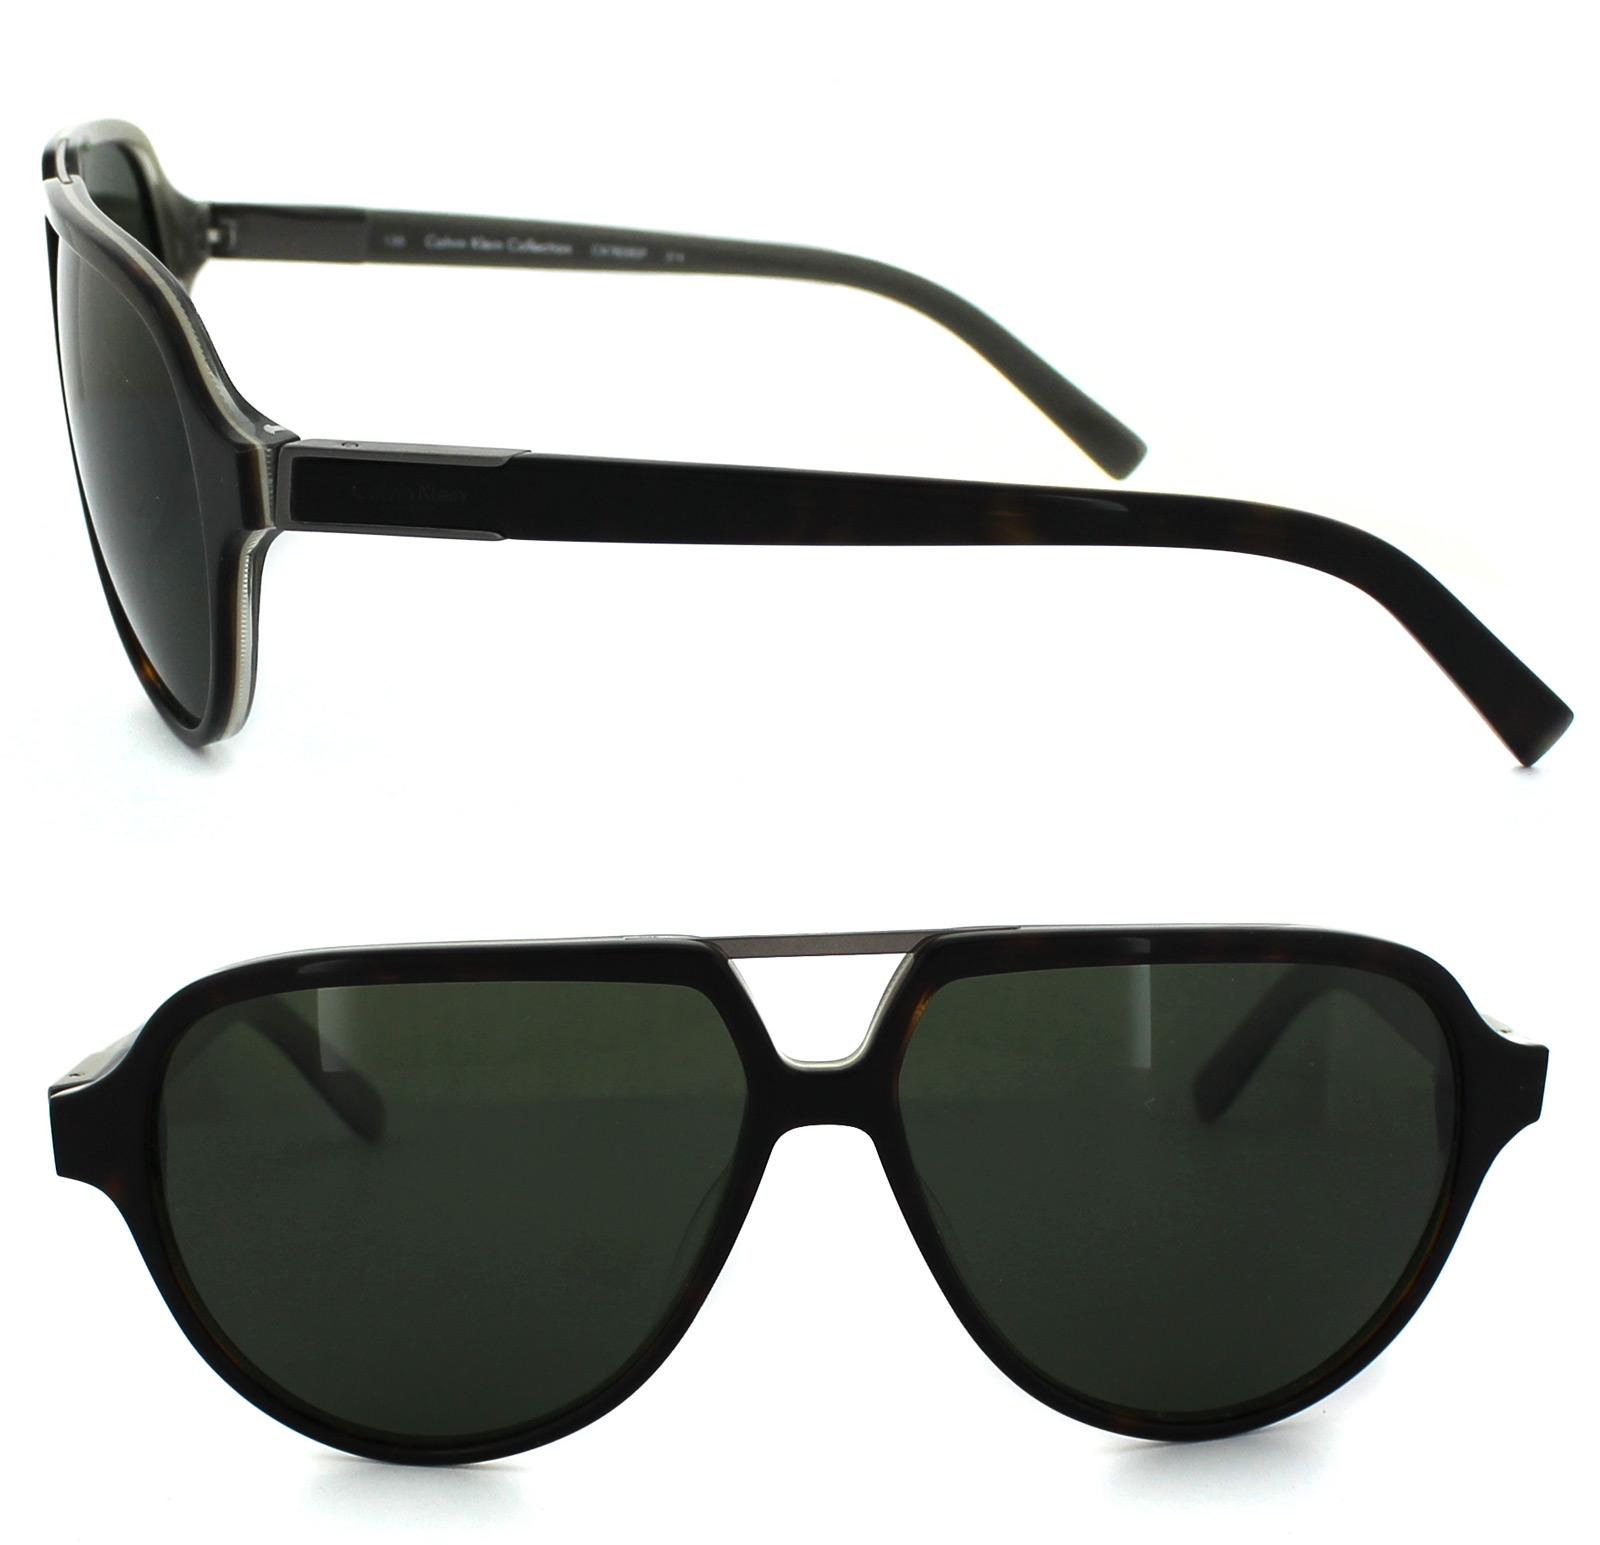 Calvin Klein Sunglasses 7858SP 214 Havana Grey Green Polarized | eBay